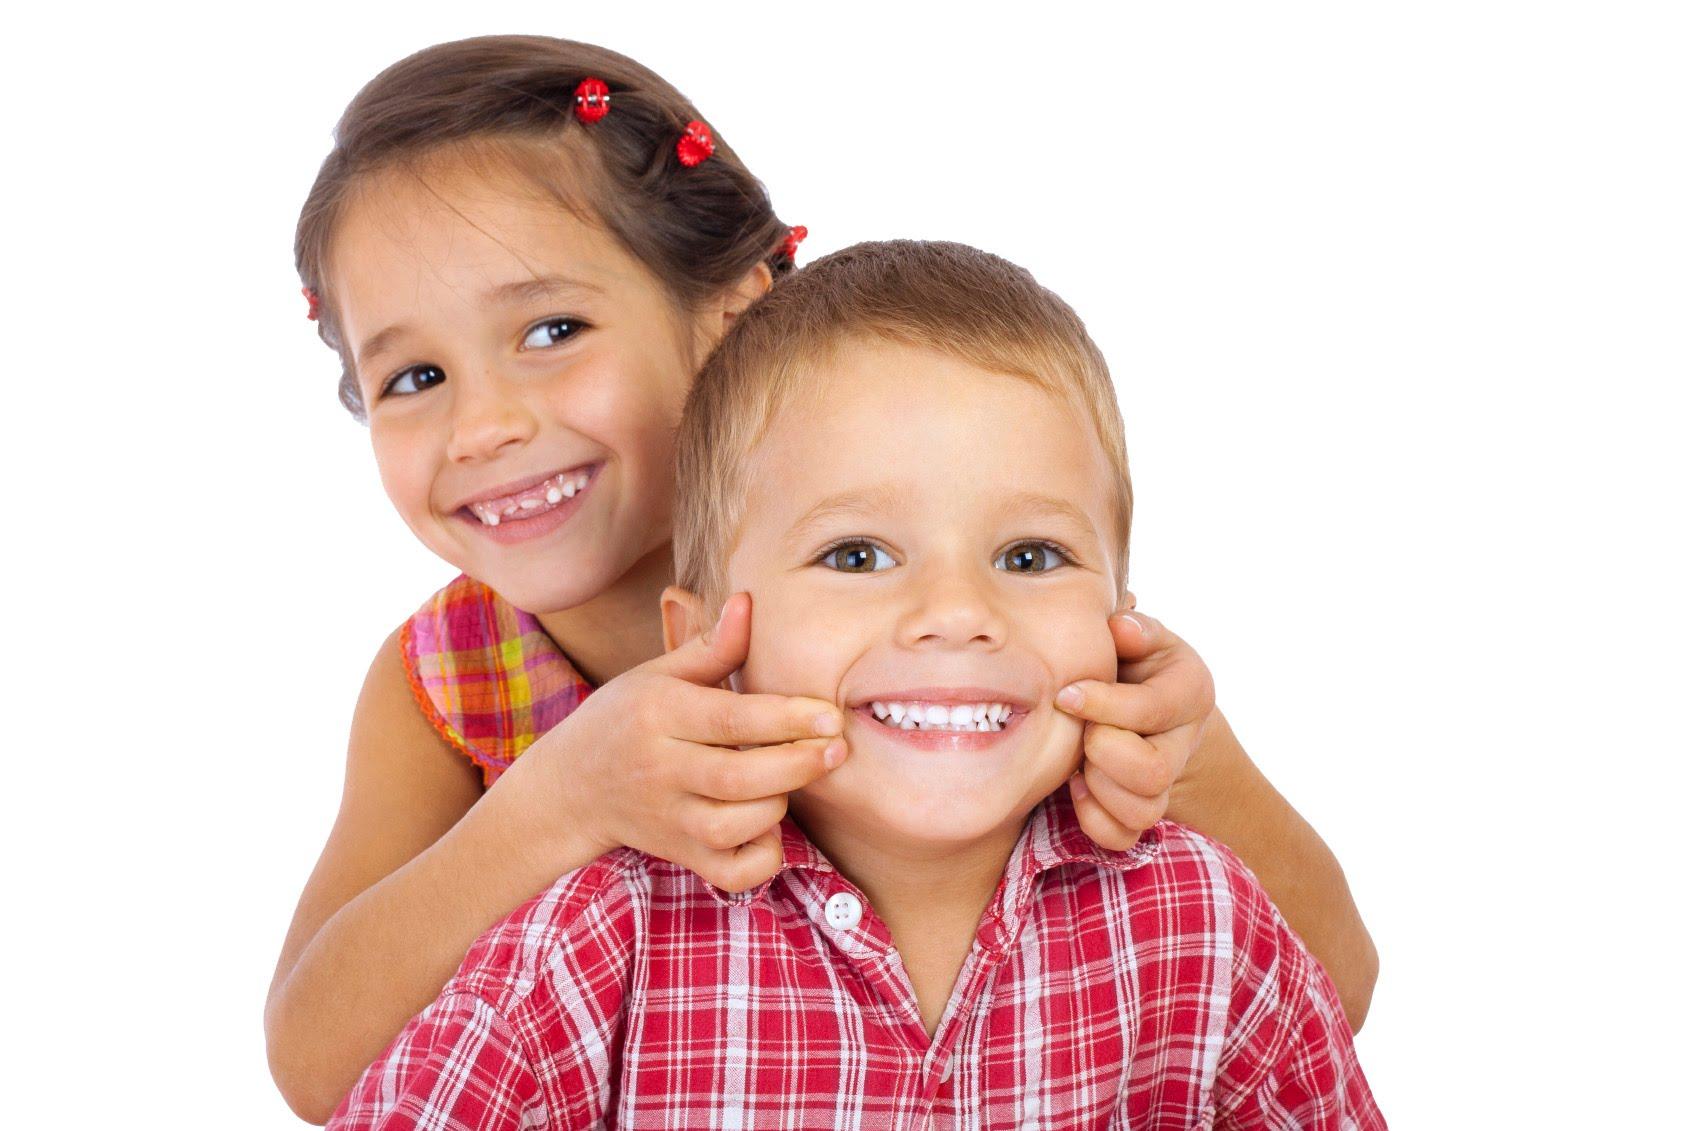 Картинках, картинки для детей улыбки